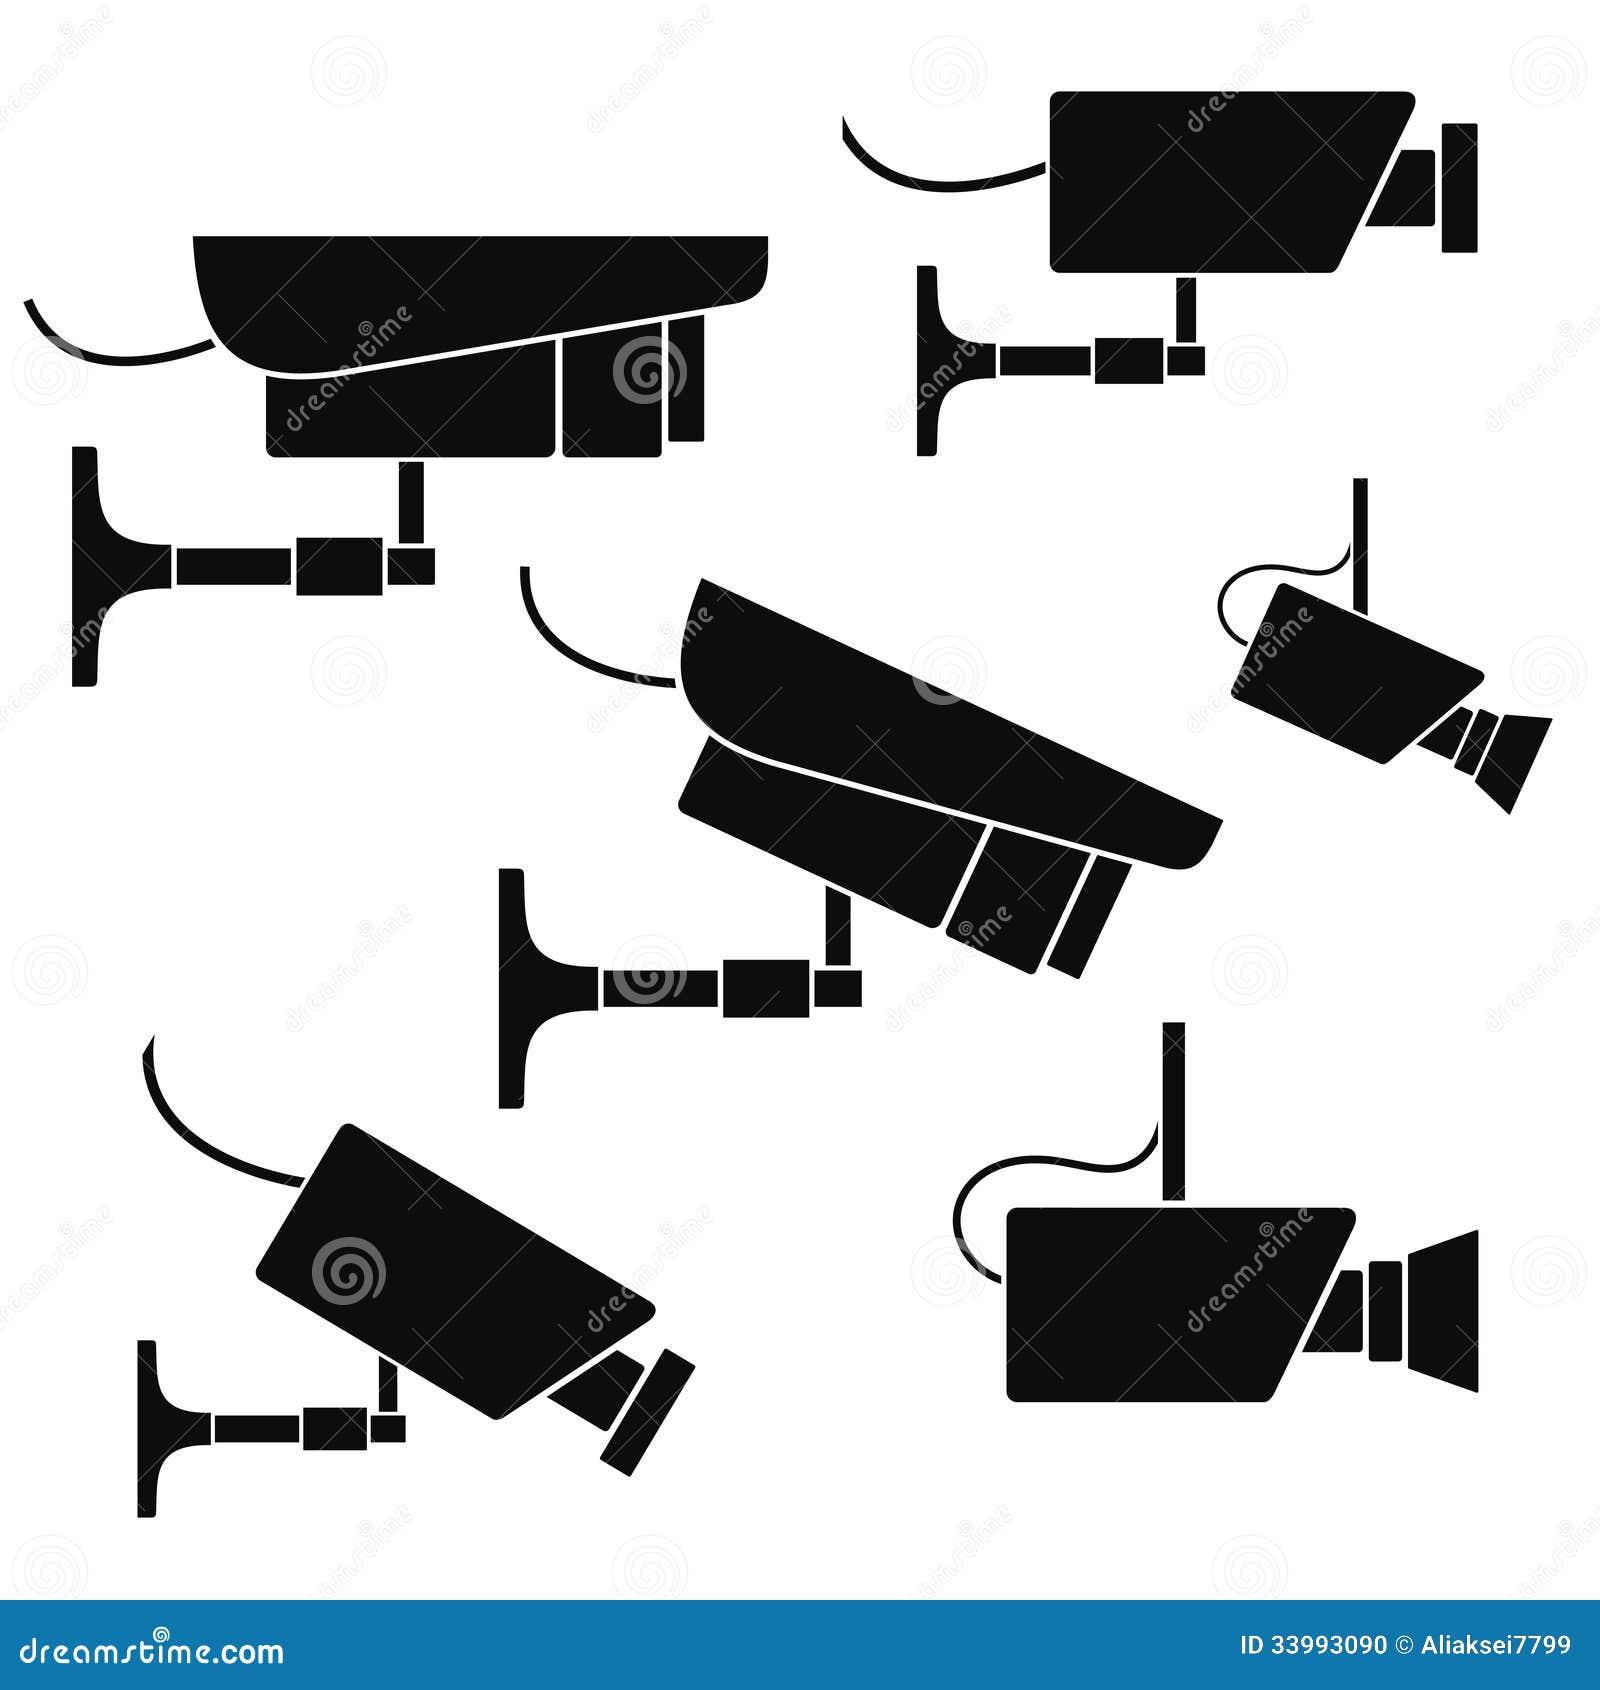 Security Camera Stock Photo - Image: 33993090